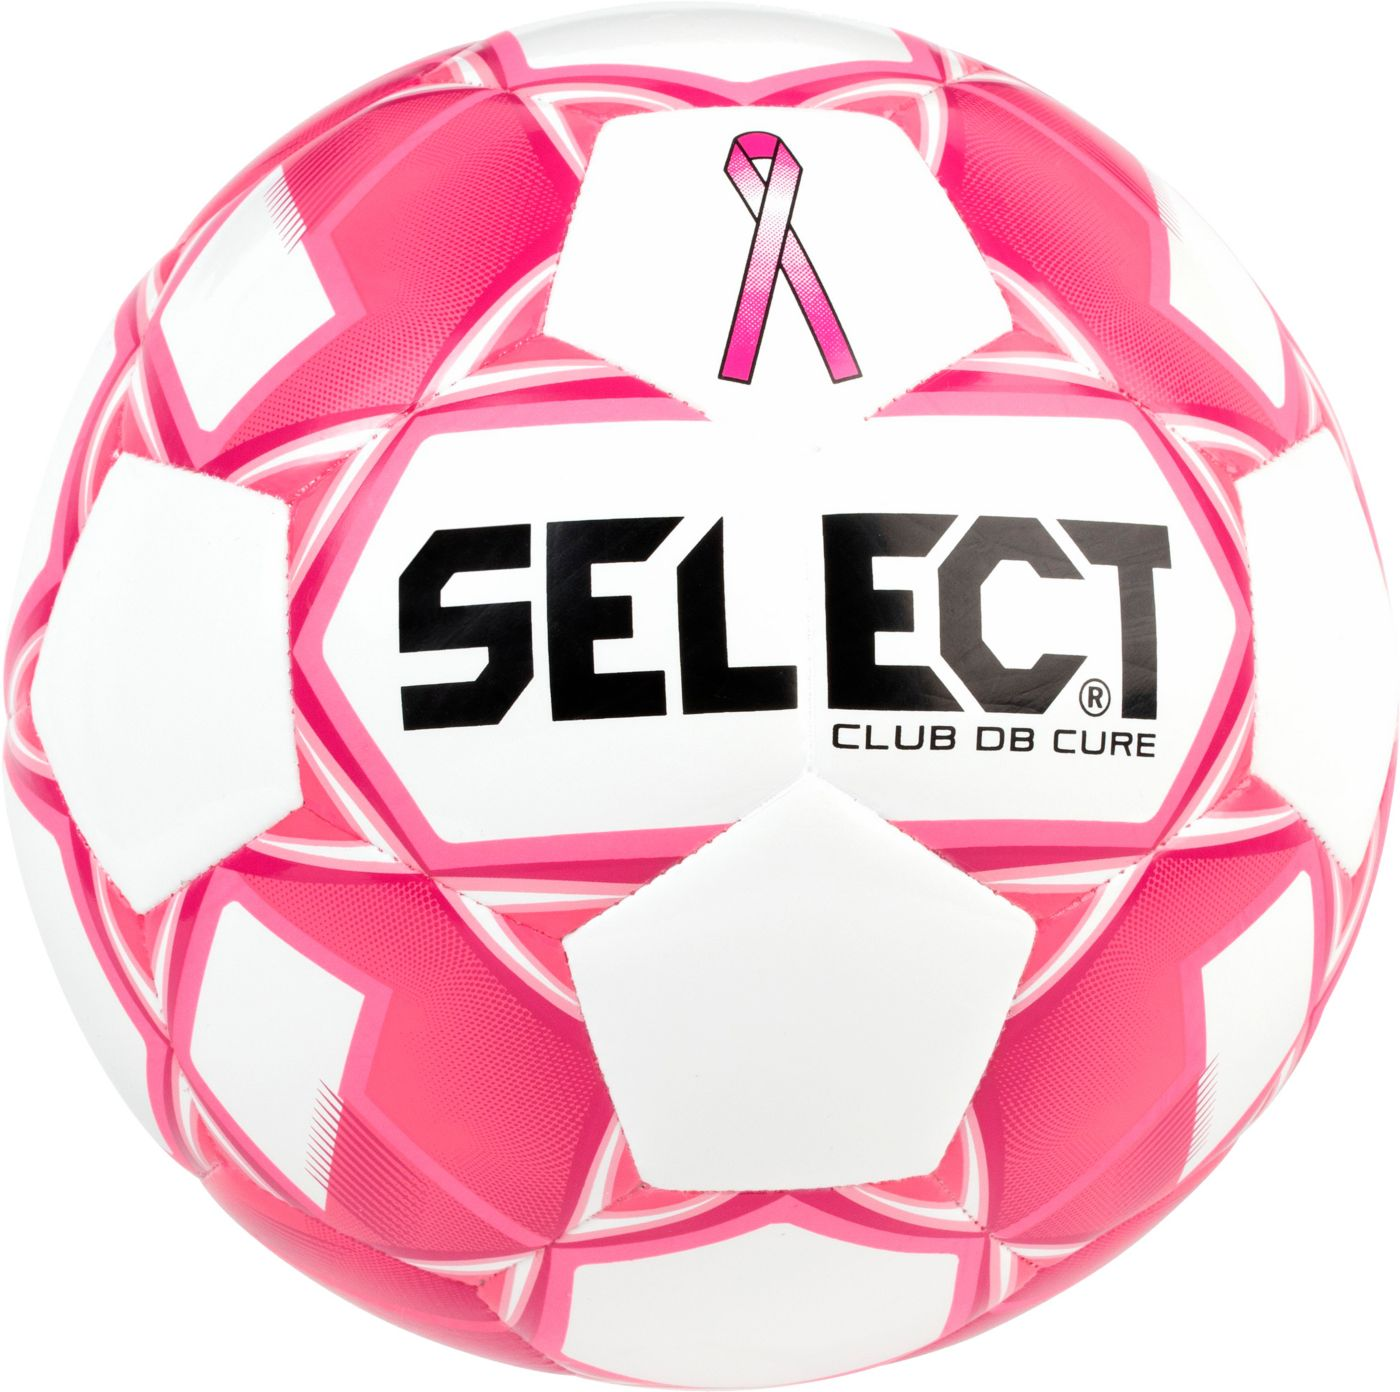 Select Club DB Cure Soccer Ball